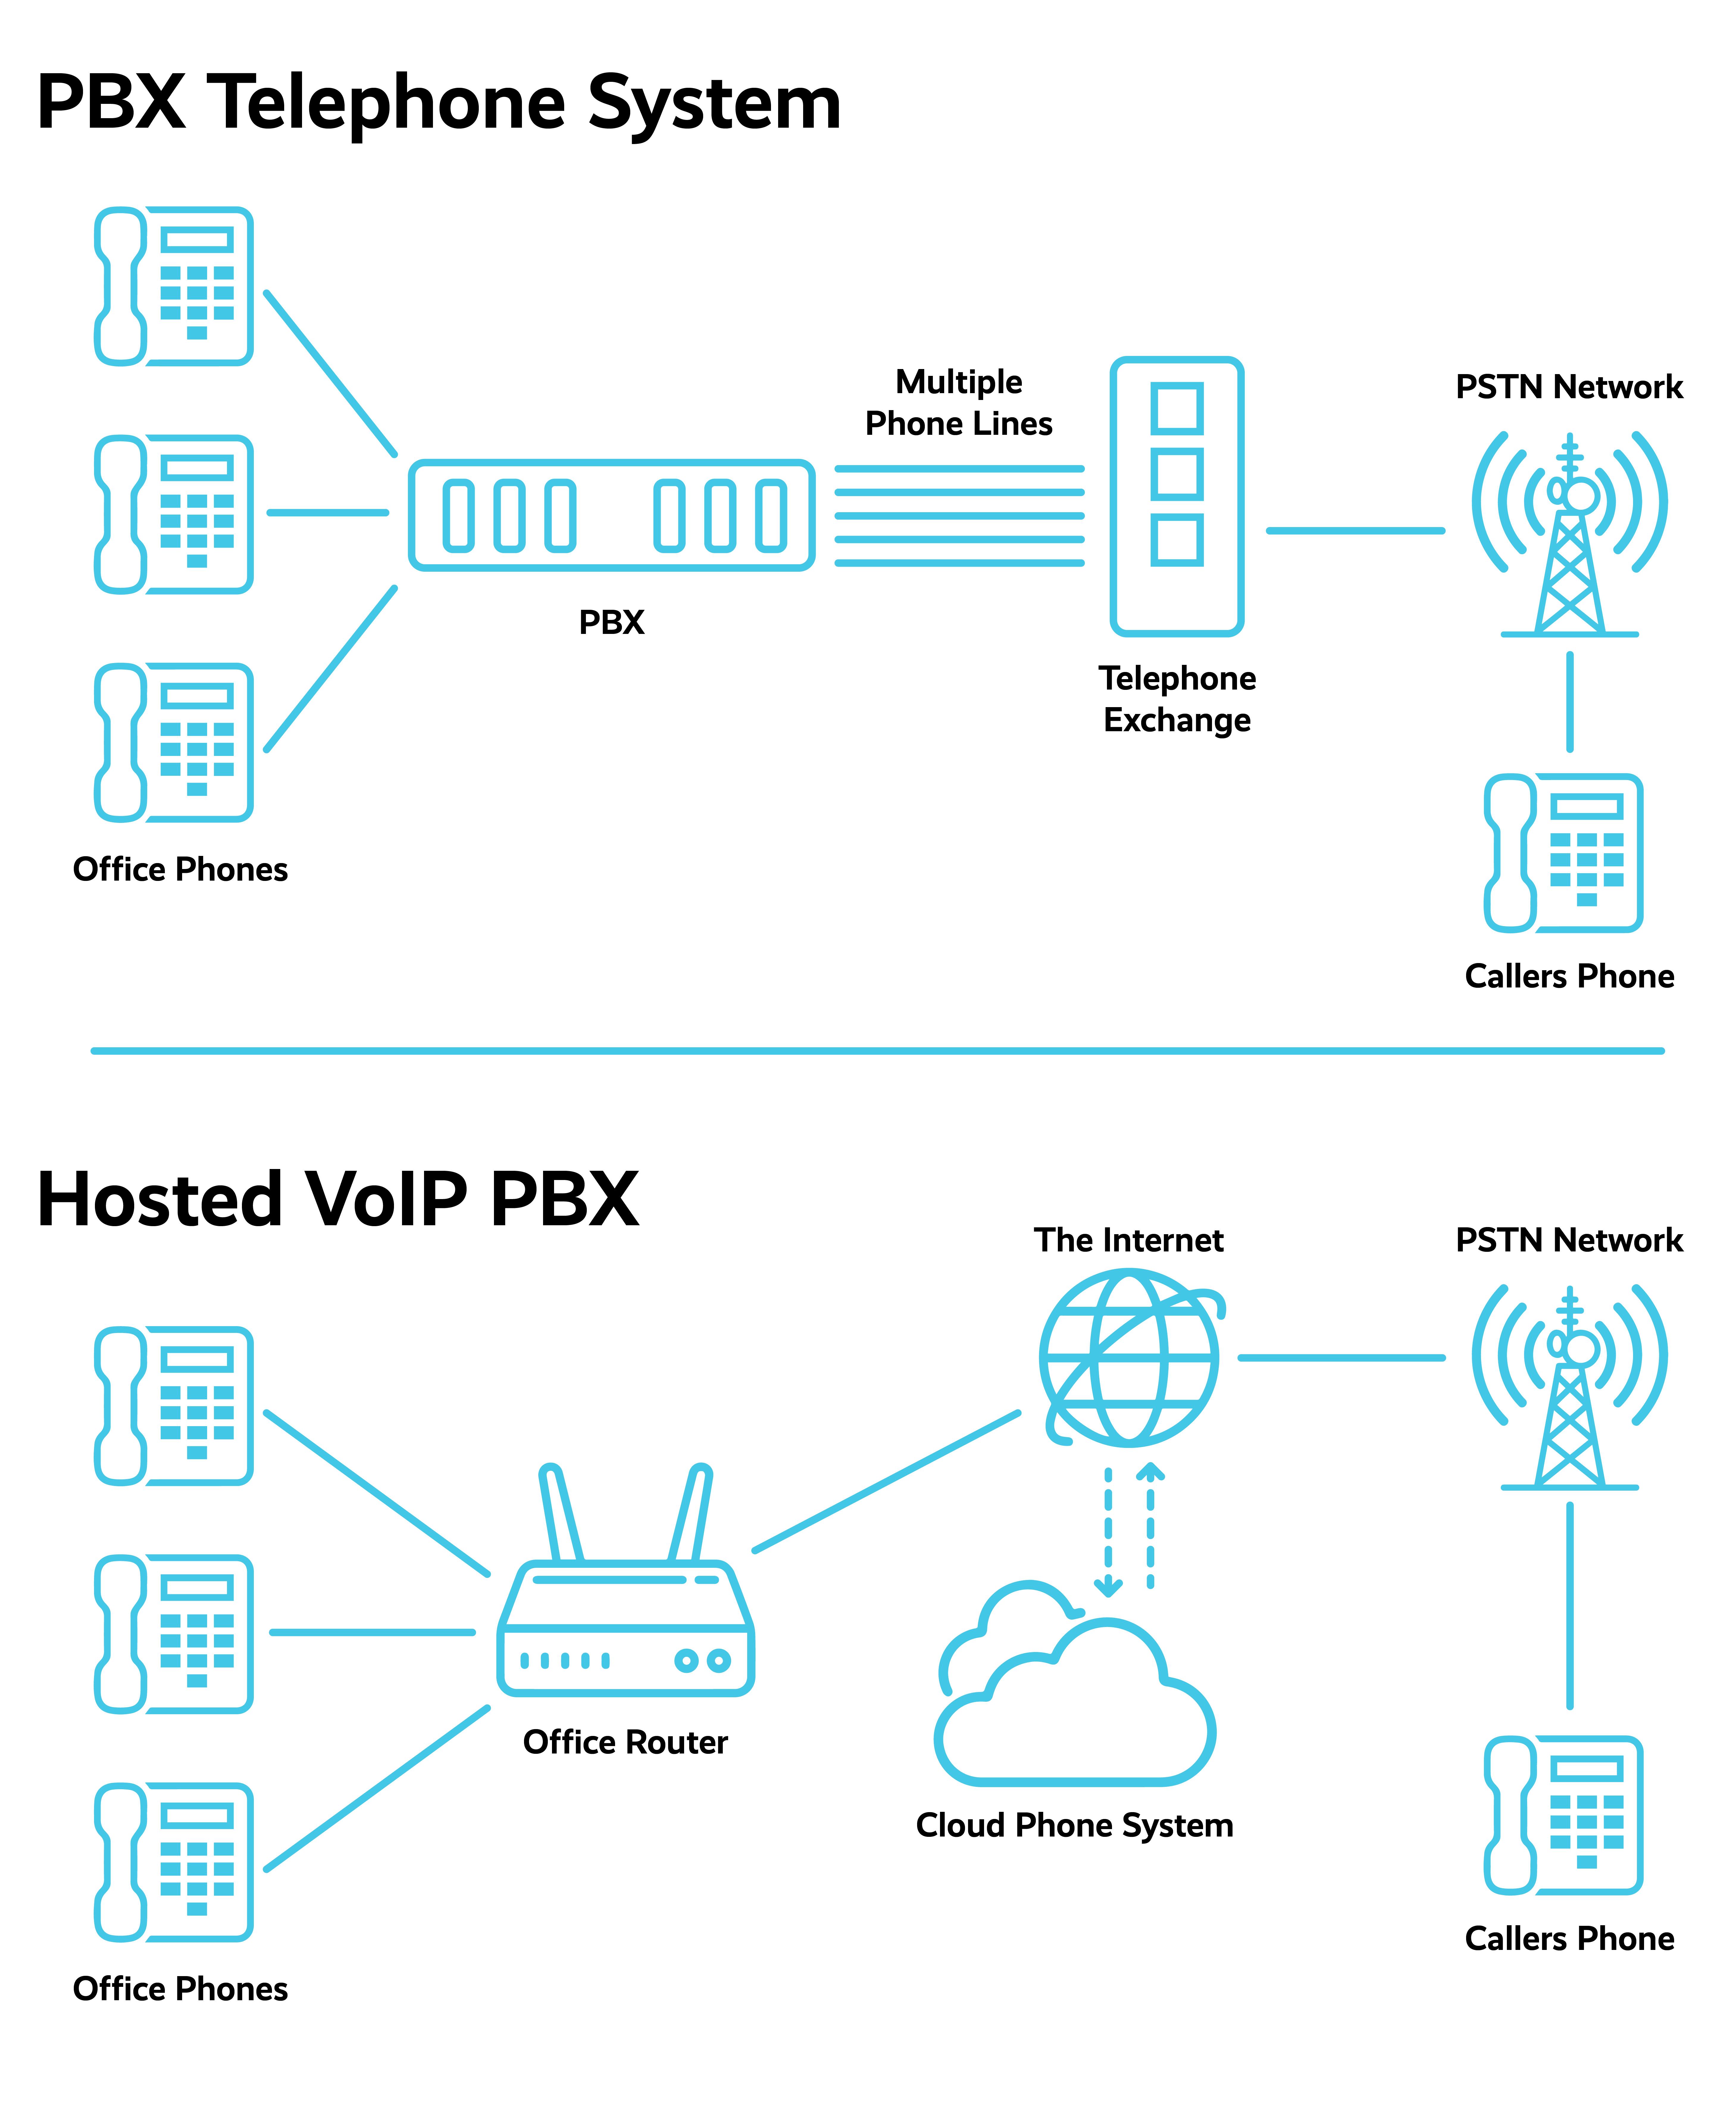 PBX telephone system diagram